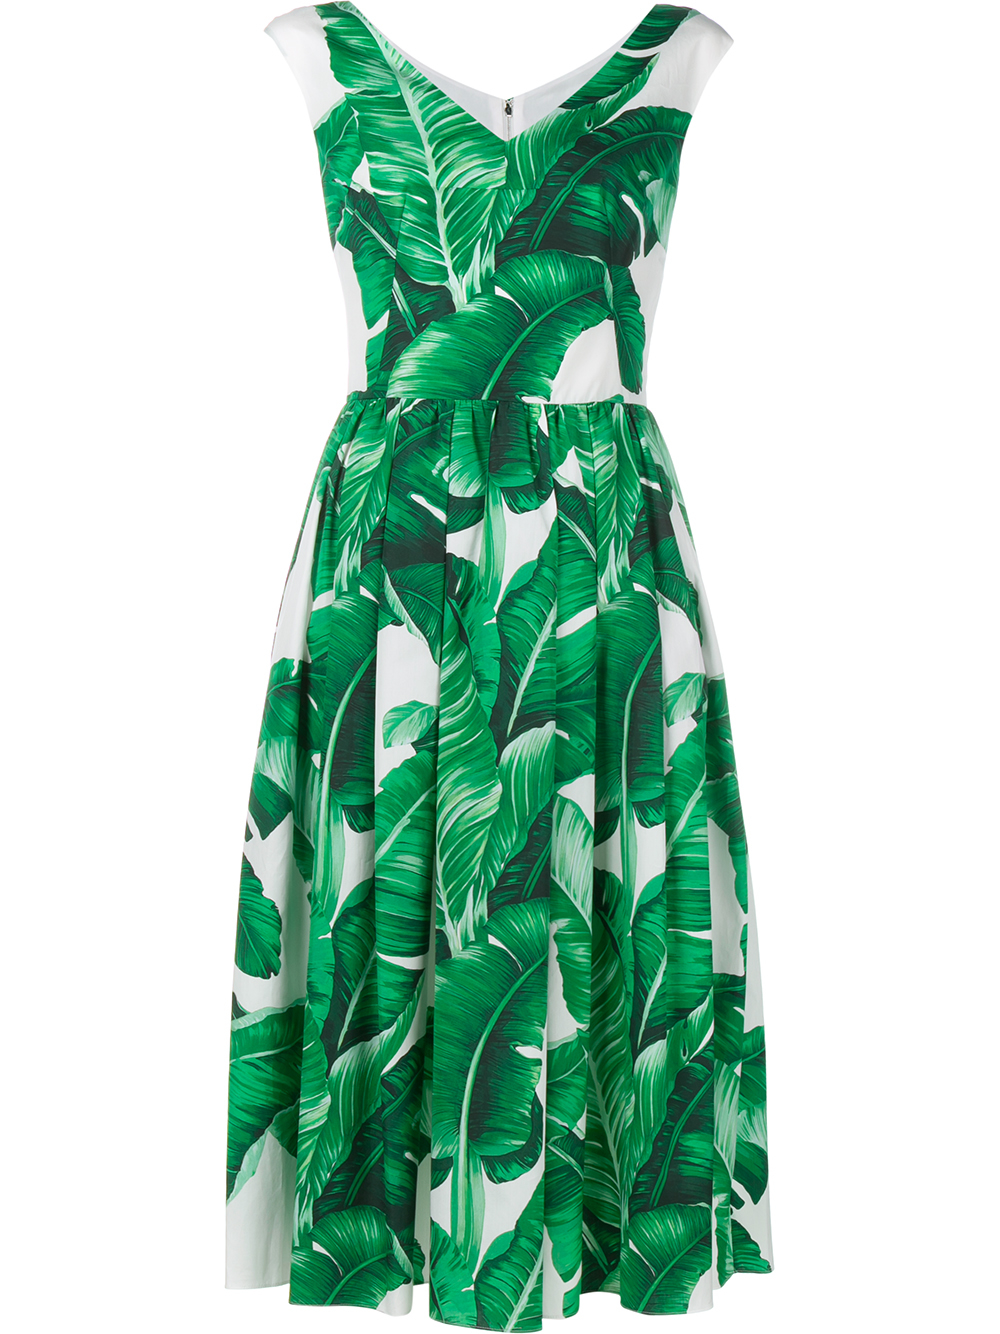 Dolce amp Gabbana Sleeveless Banana Leaf Print Cotton Dress